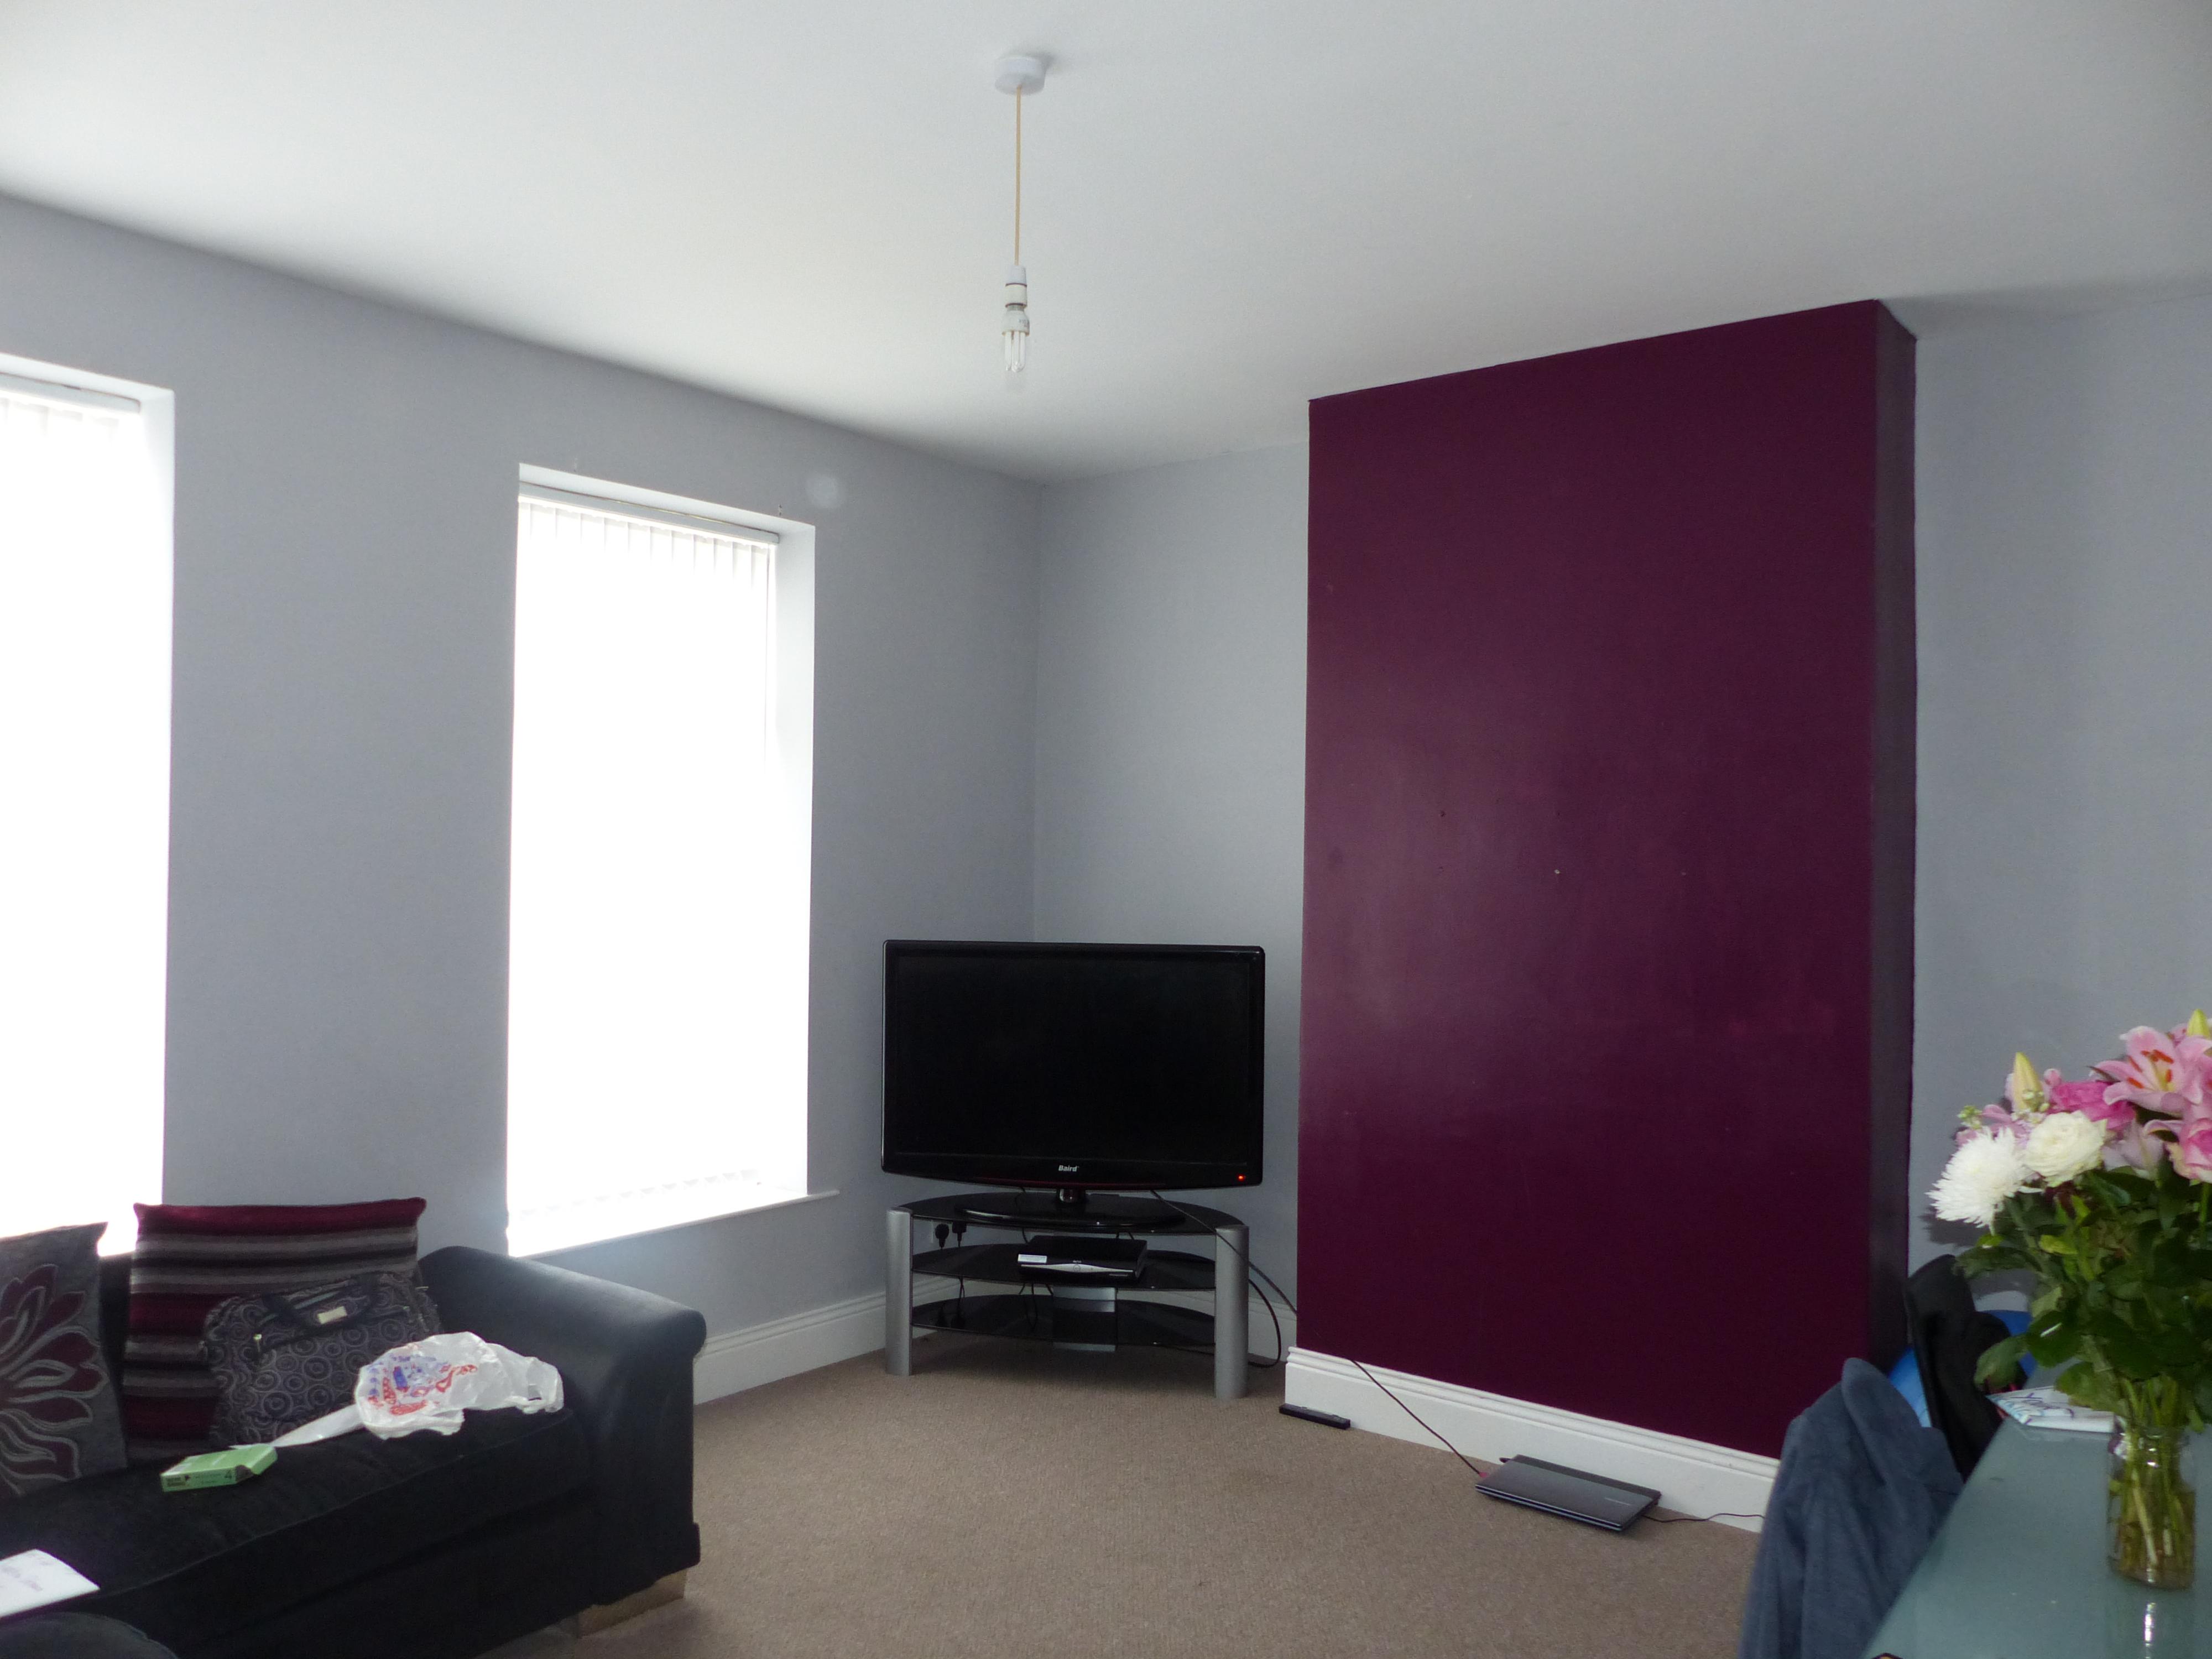 1 Bedroom Flat To Rent Gladstone Street Sunderland Sr